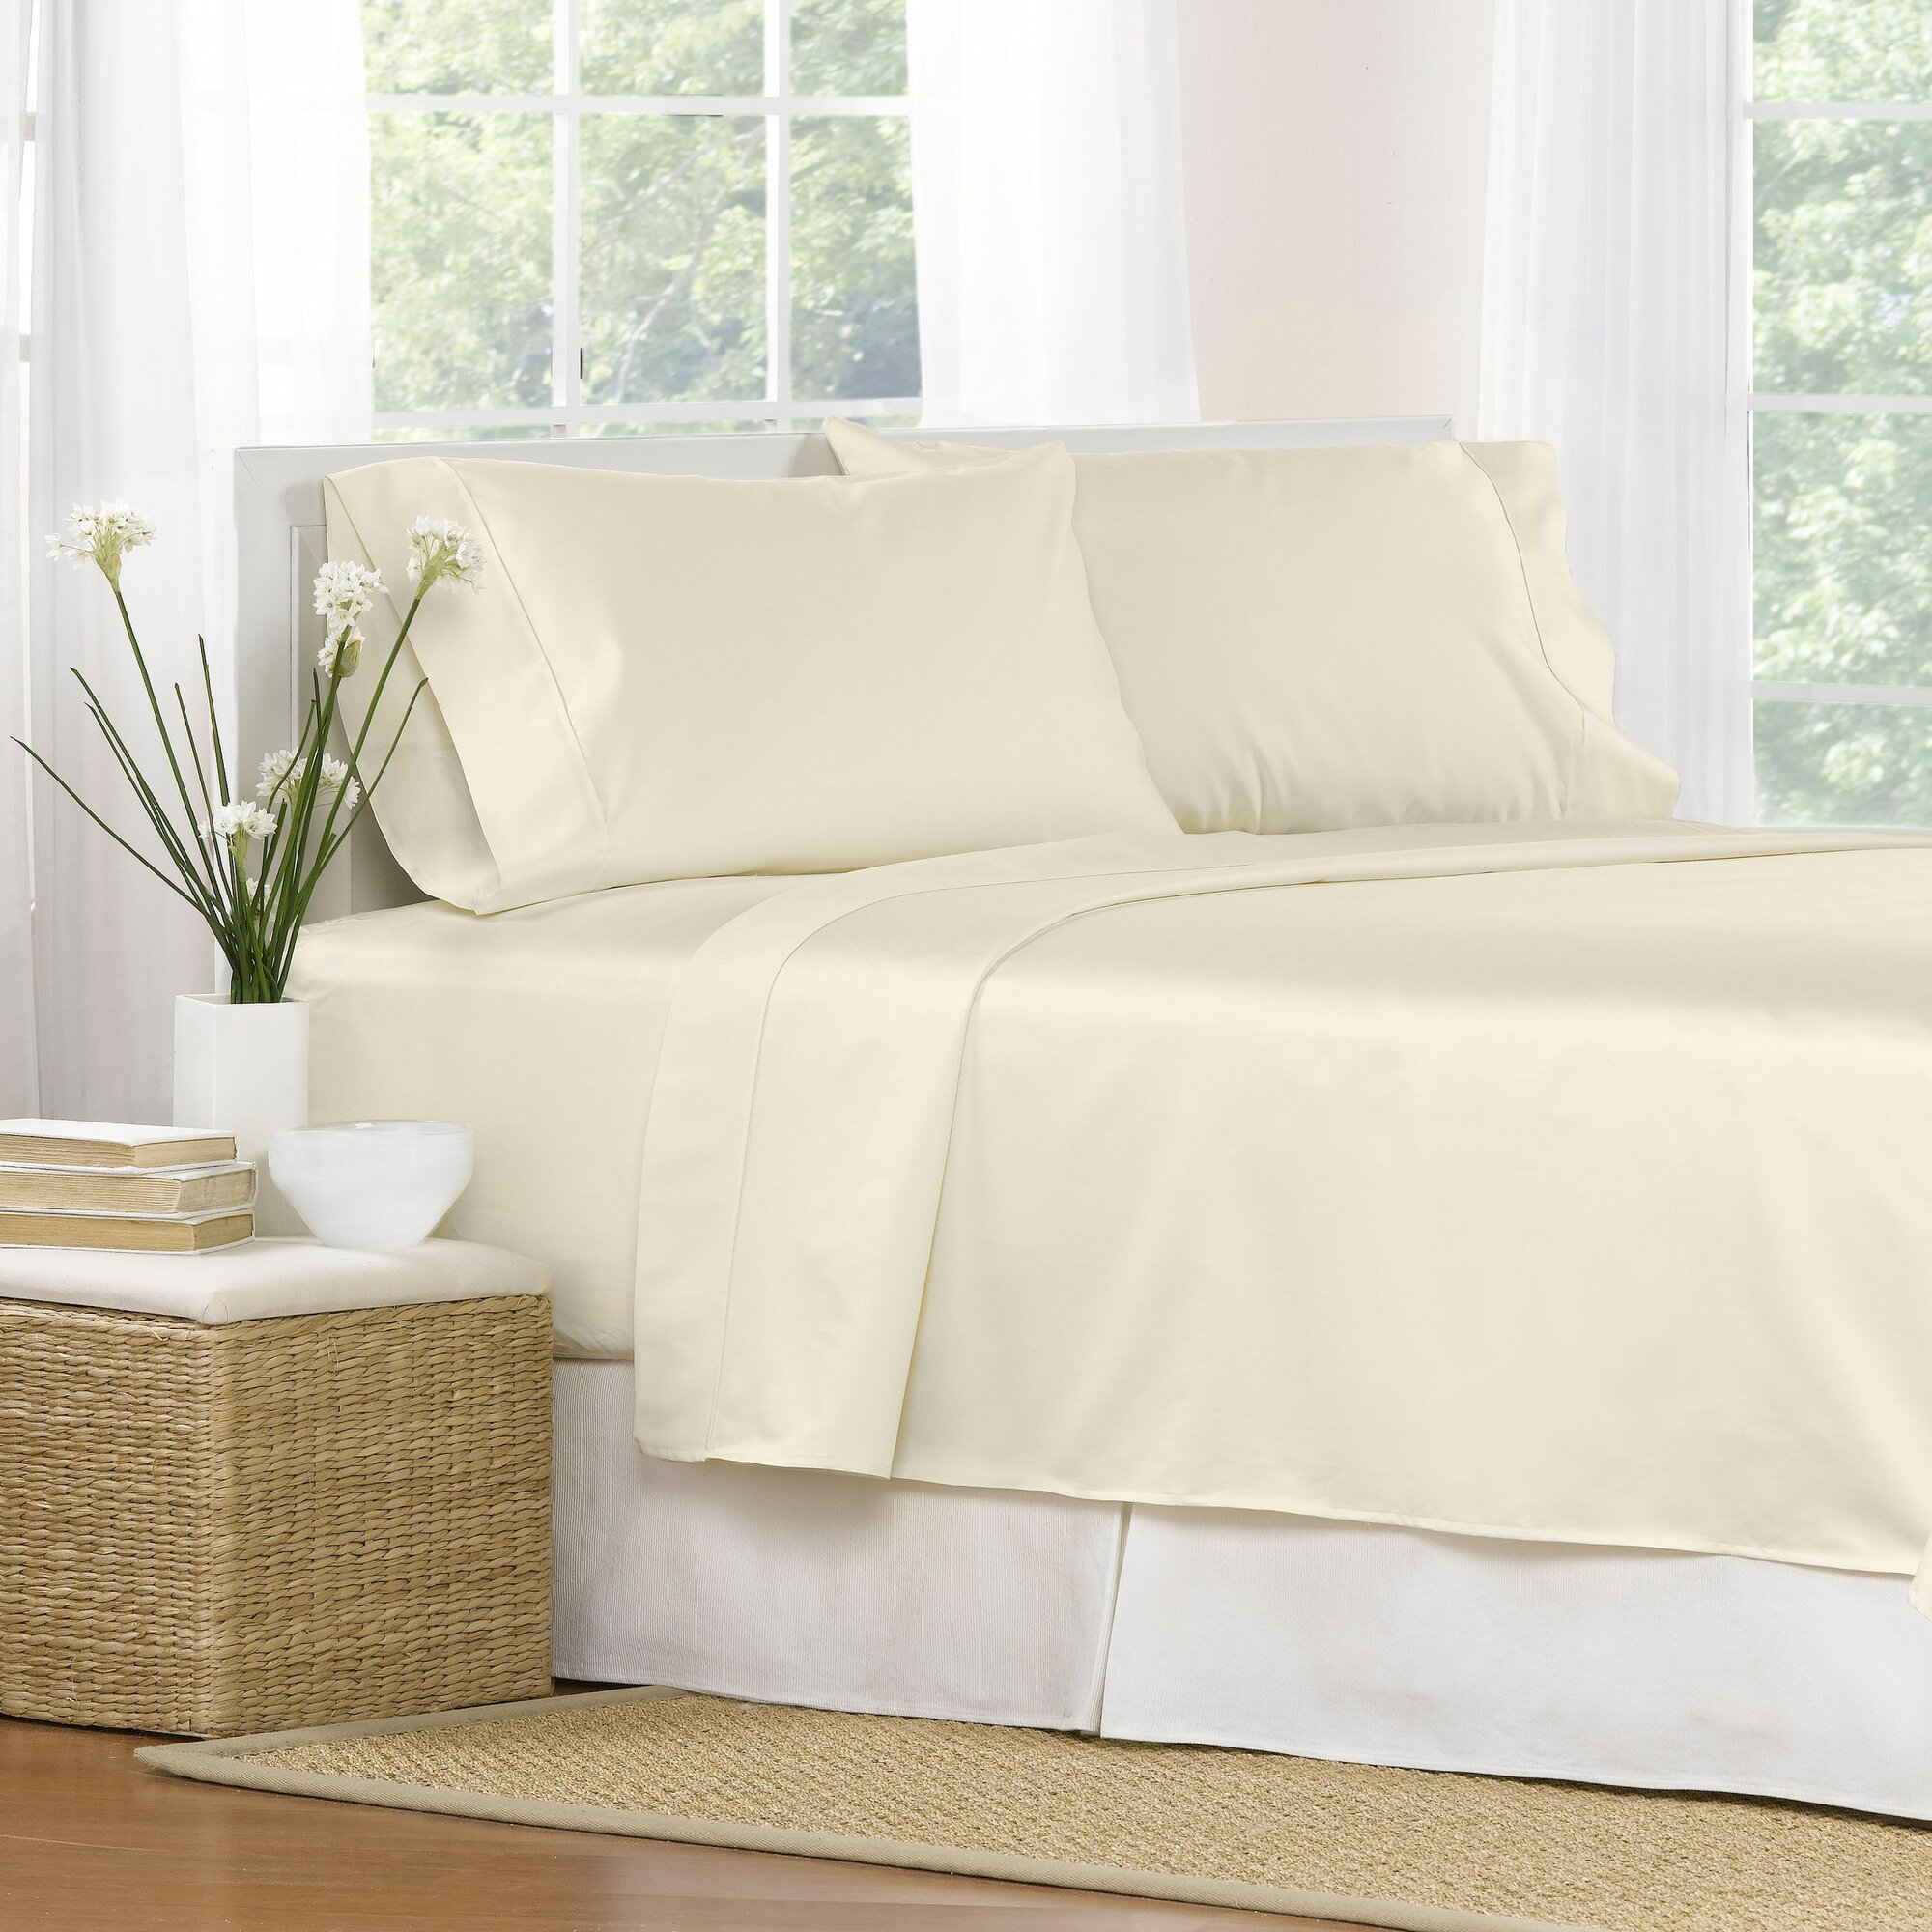 aspire linens 4 piece 1000 thread count egyptian quality cotton sheet set reviews wayfair. Black Bedroom Furniture Sets. Home Design Ideas